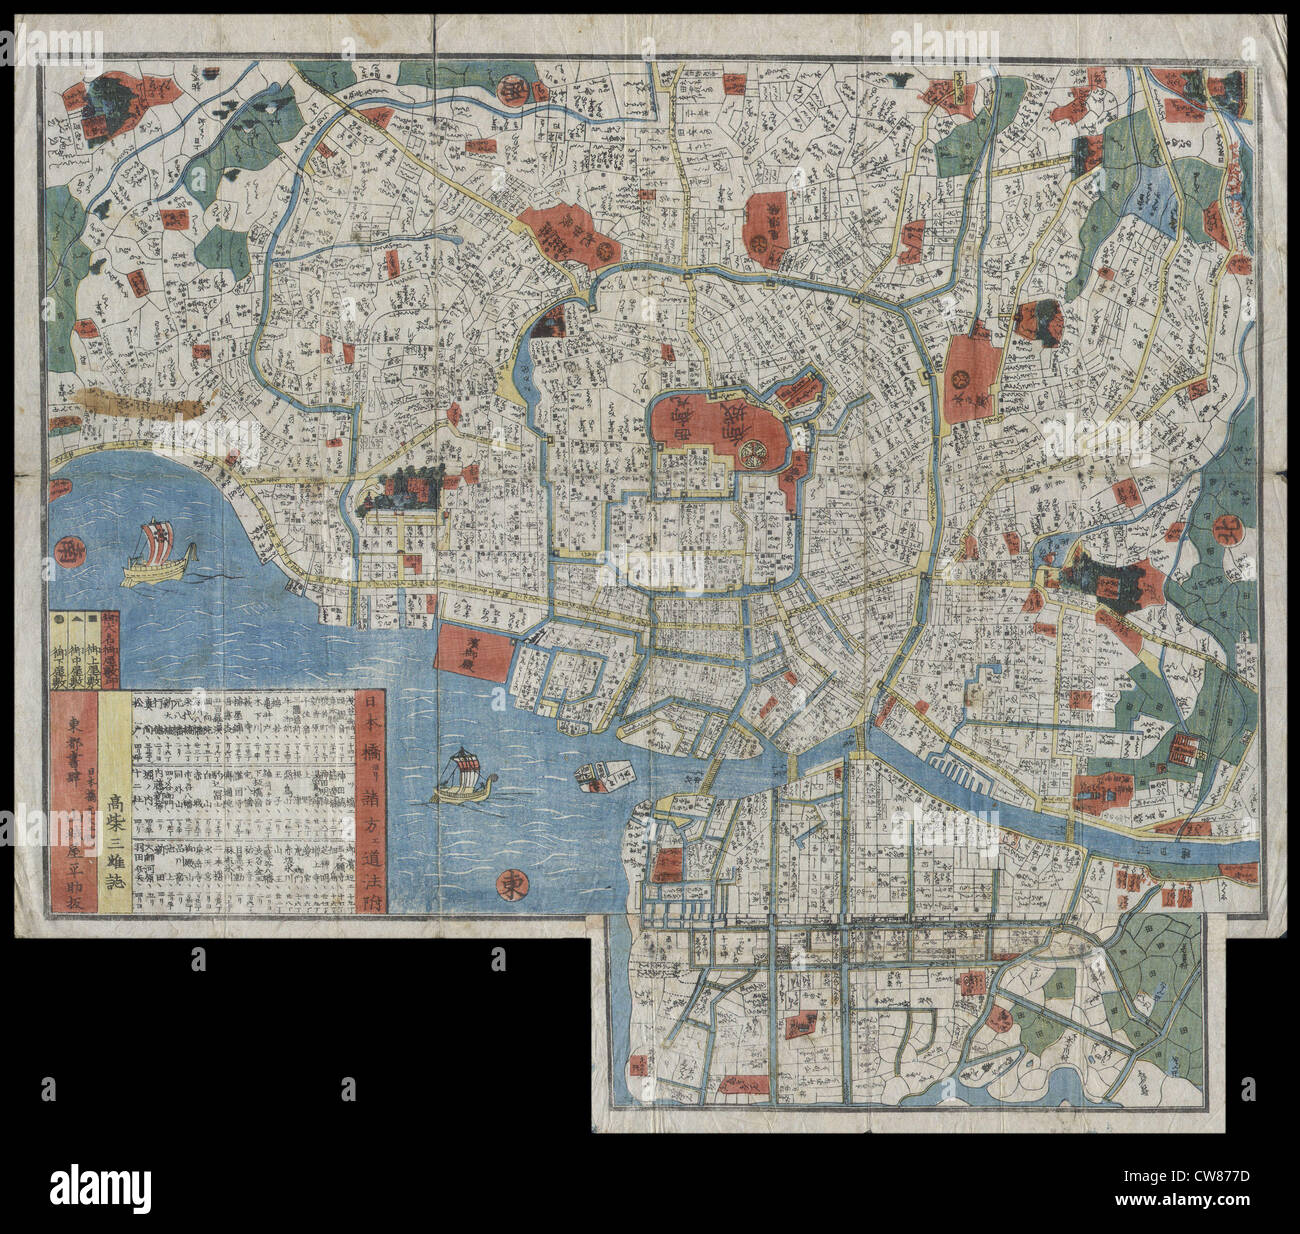 1850 Edo Period Woodcut Map Of Edo Or Tokyo Japan Stock Photo